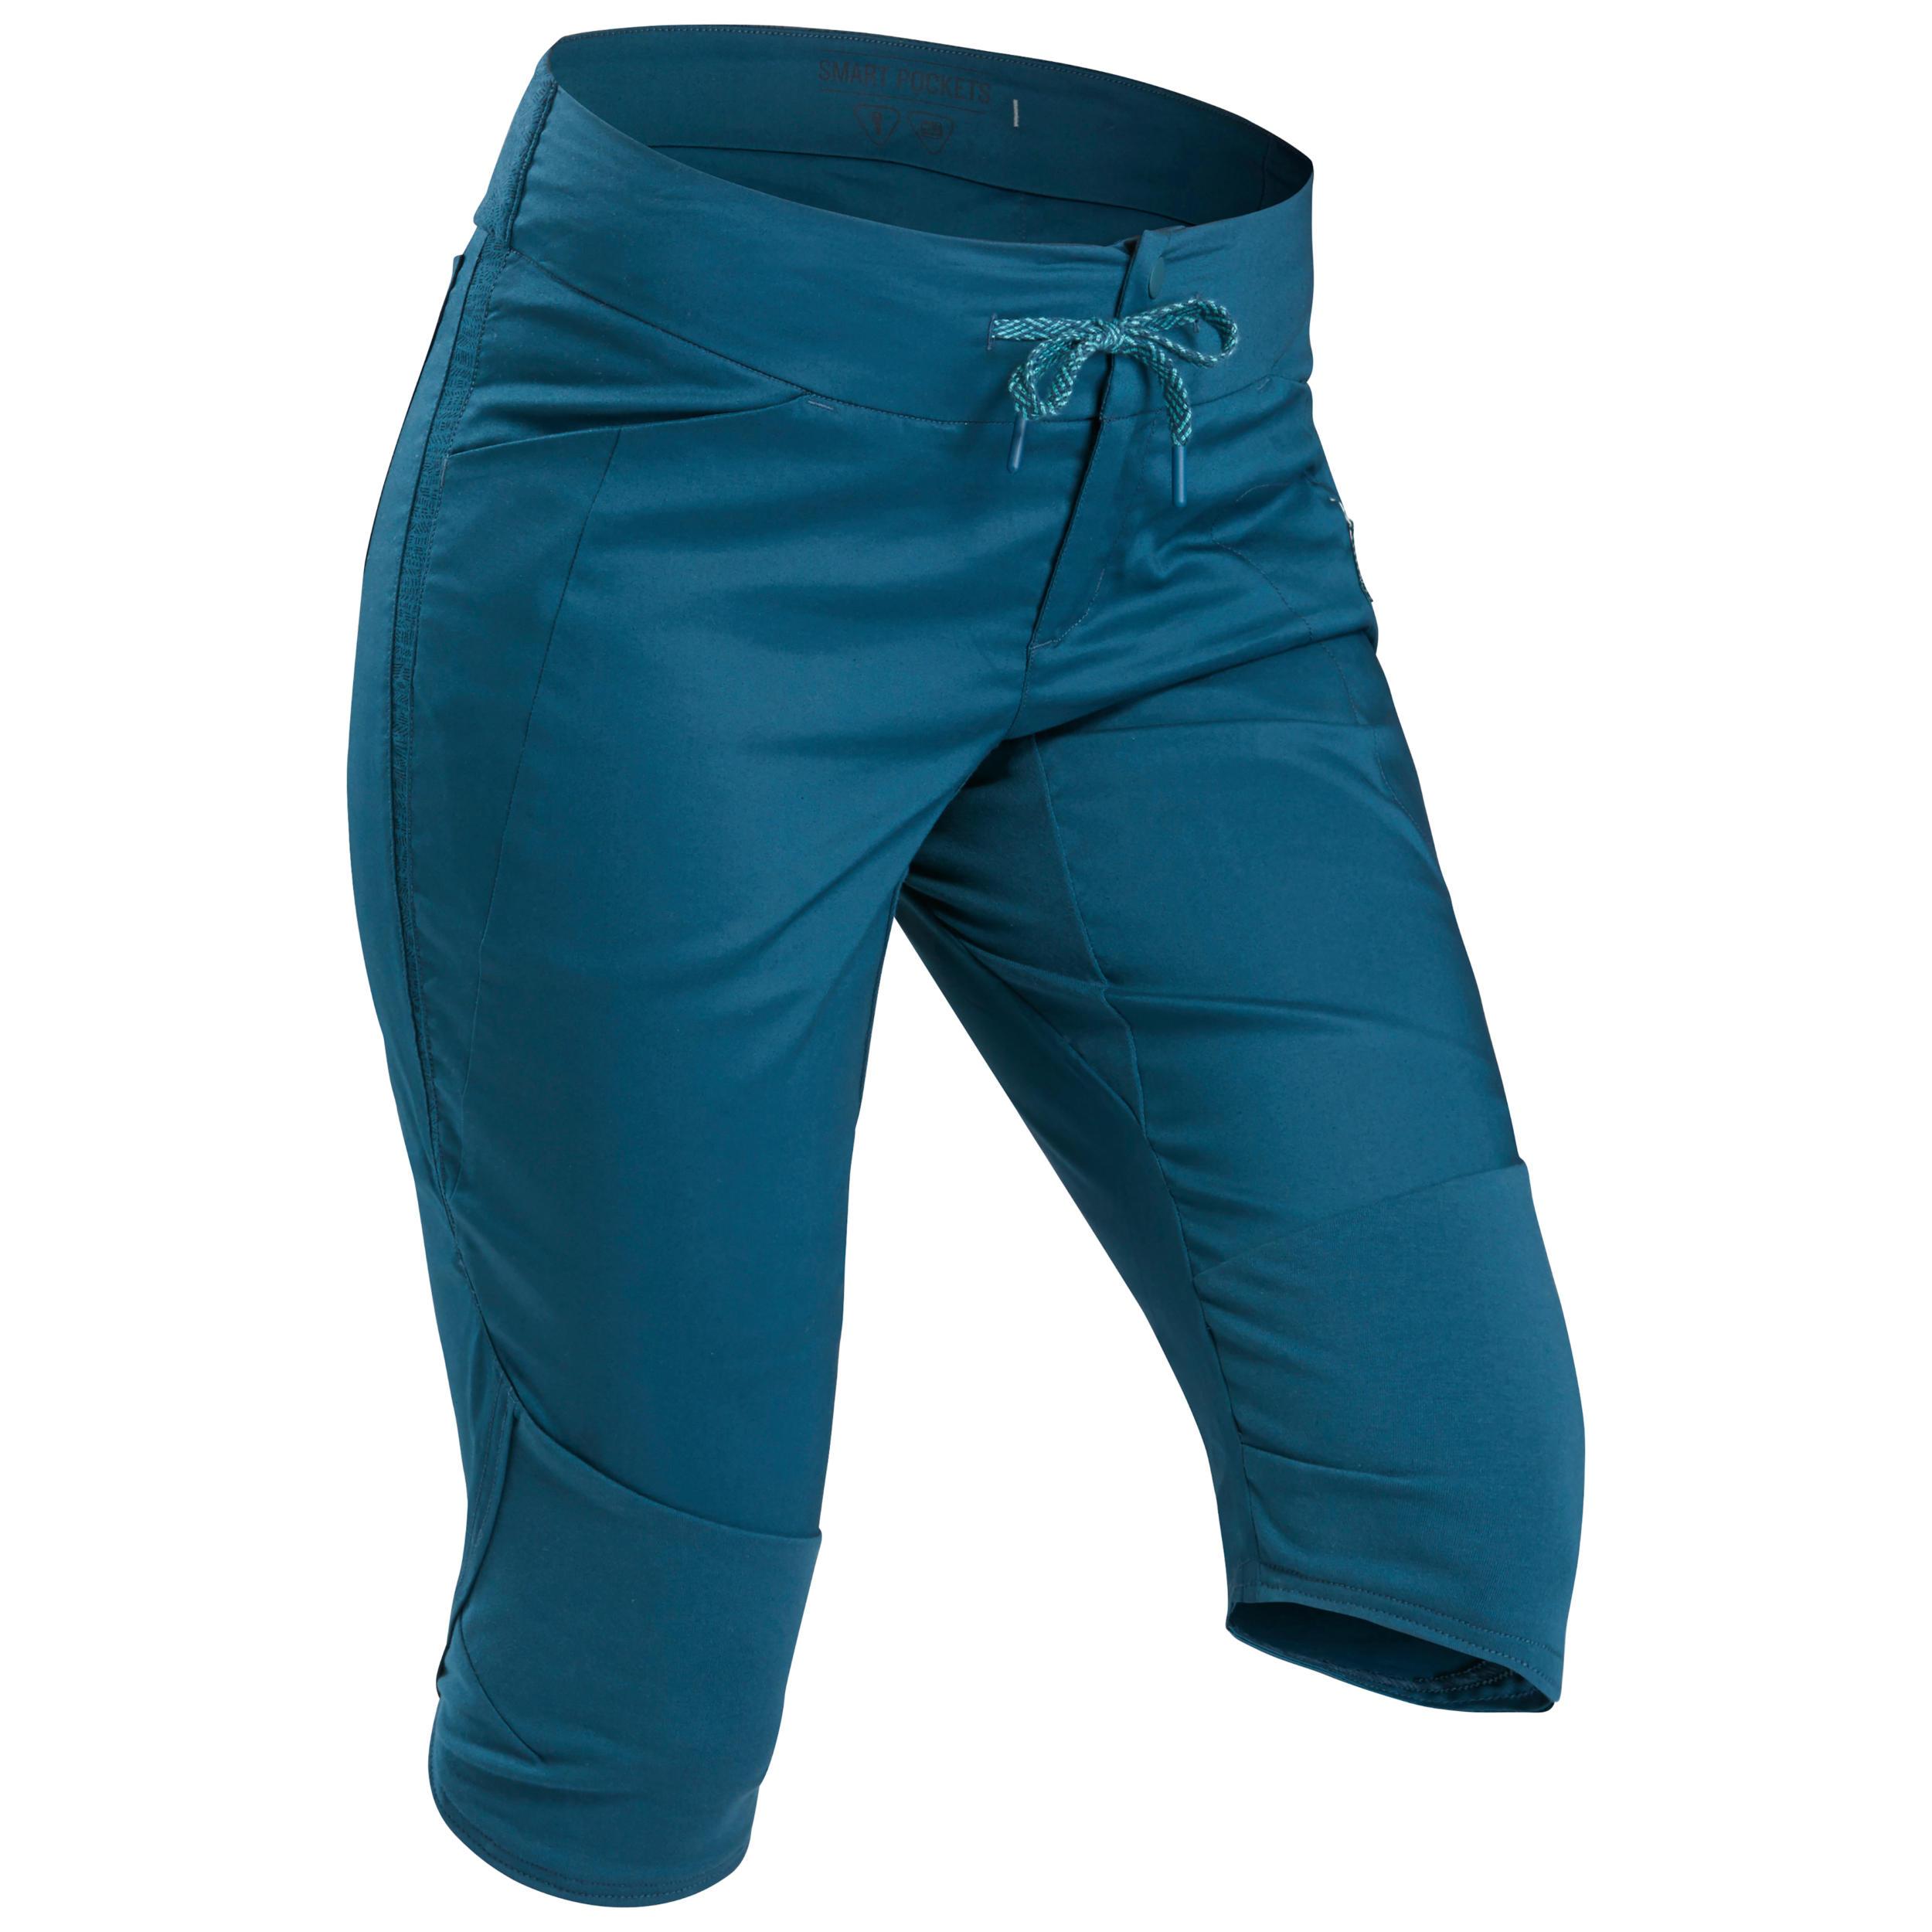 Wanderhose Dreiviertel-Hose Naturwandern NH500 Damen blau